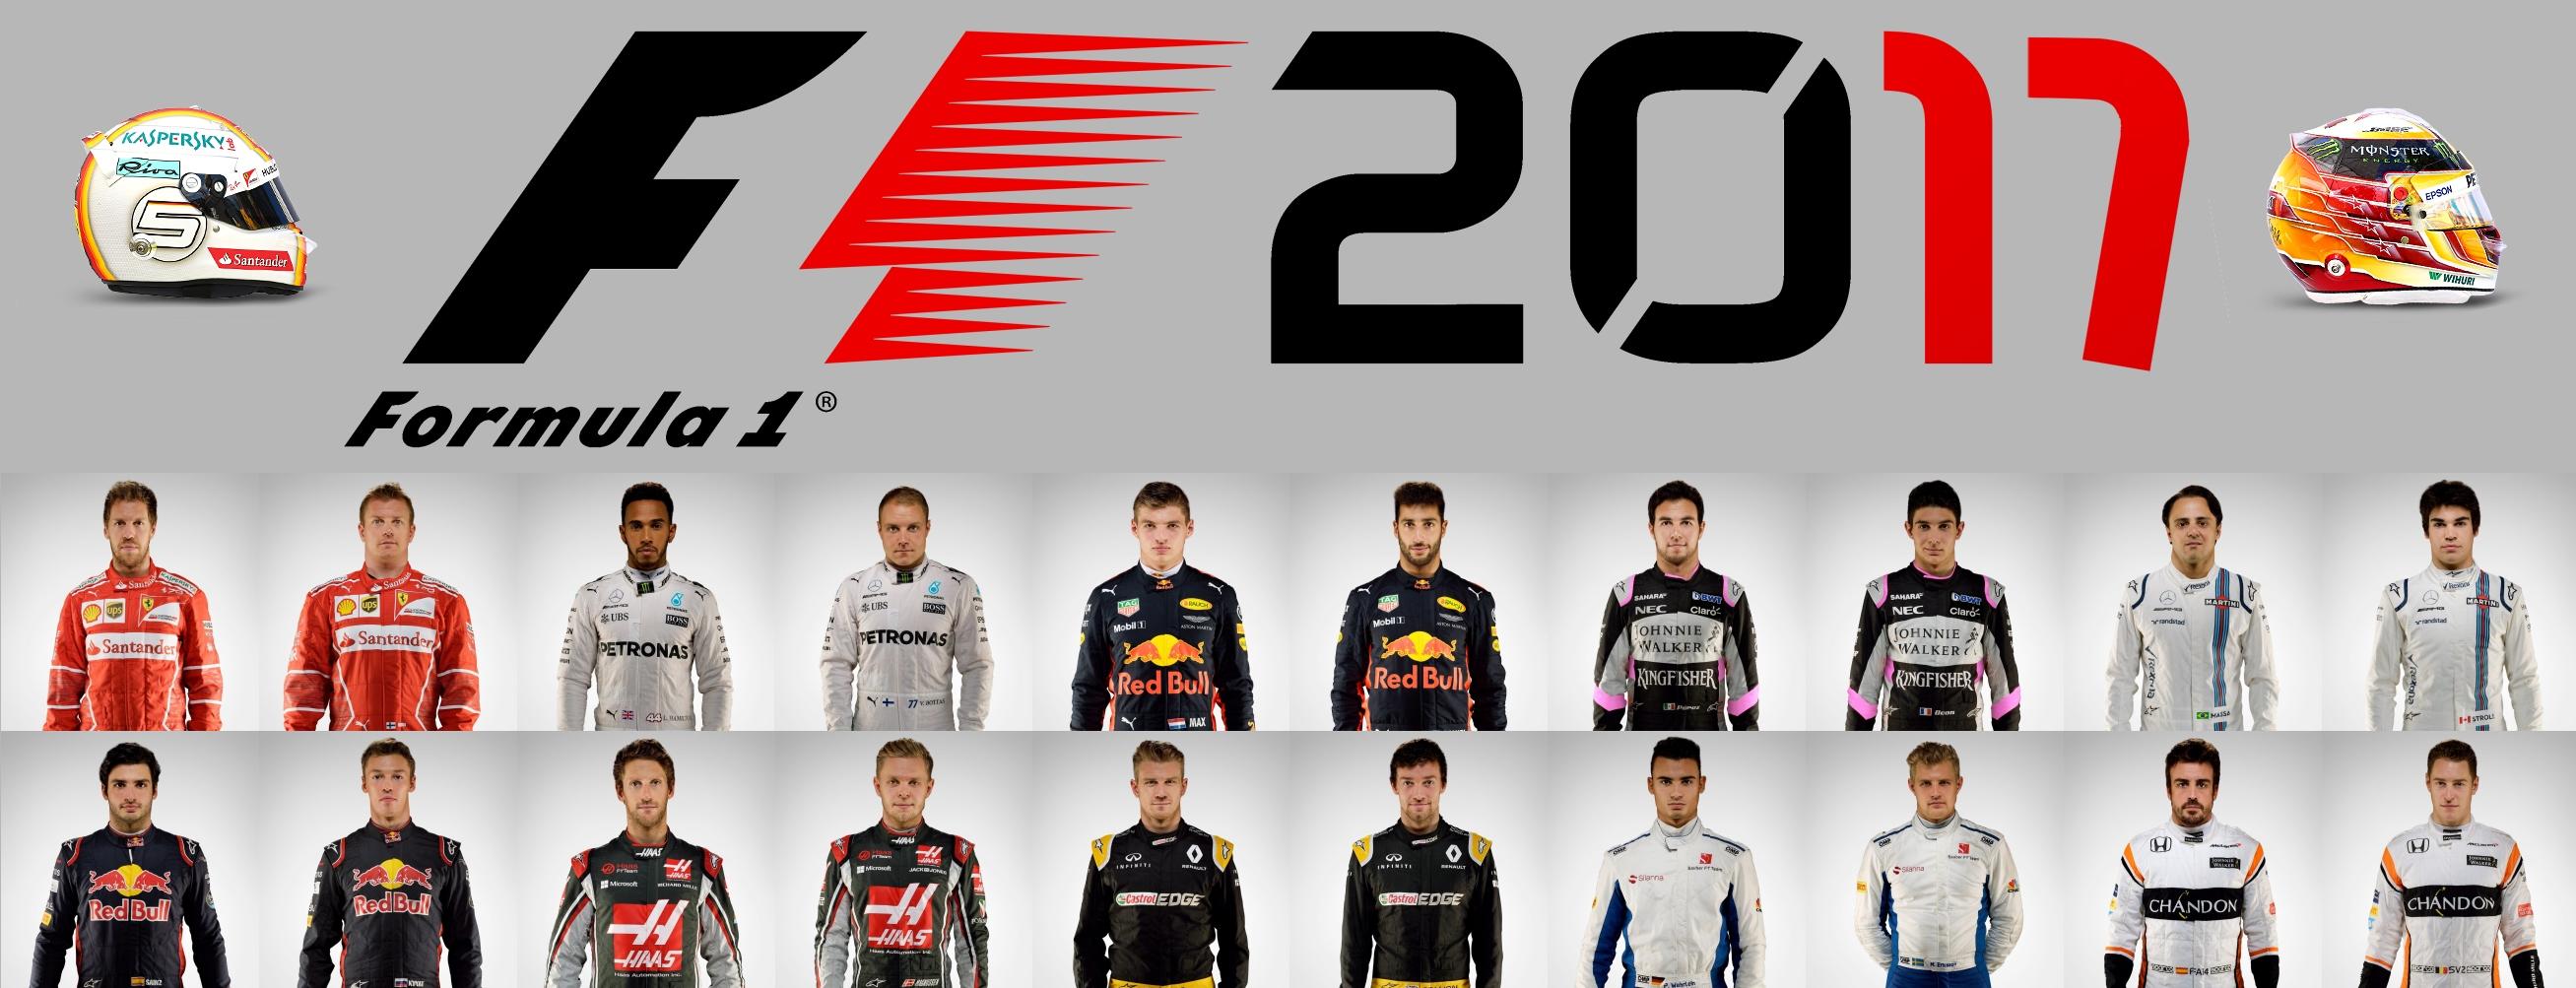 F1 2017 Drivers.jpg